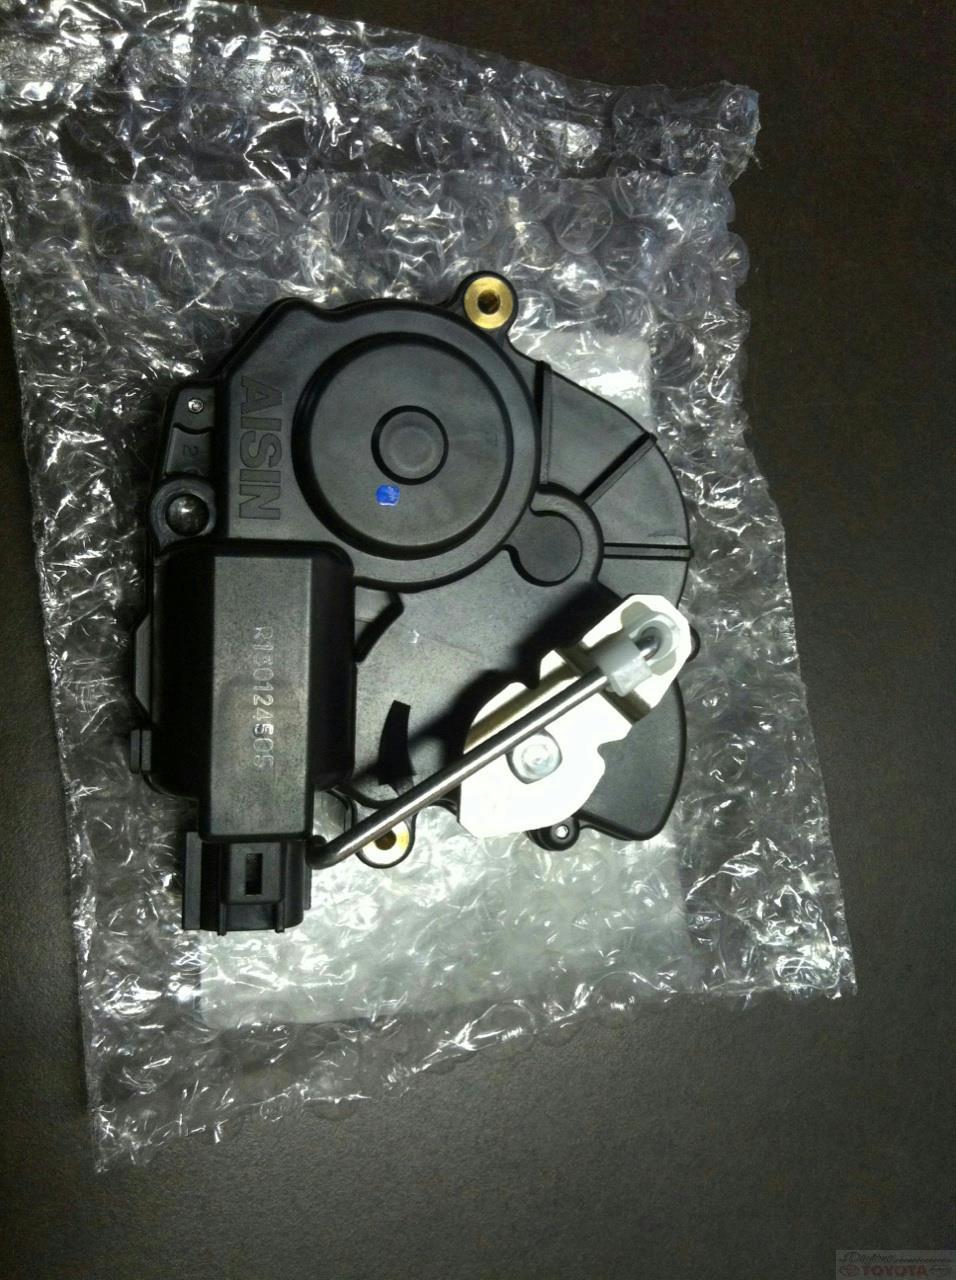 Oem 2007 2010 Toyota Sienna Sliding Door Motor Assembly 85620 08061 Ebay